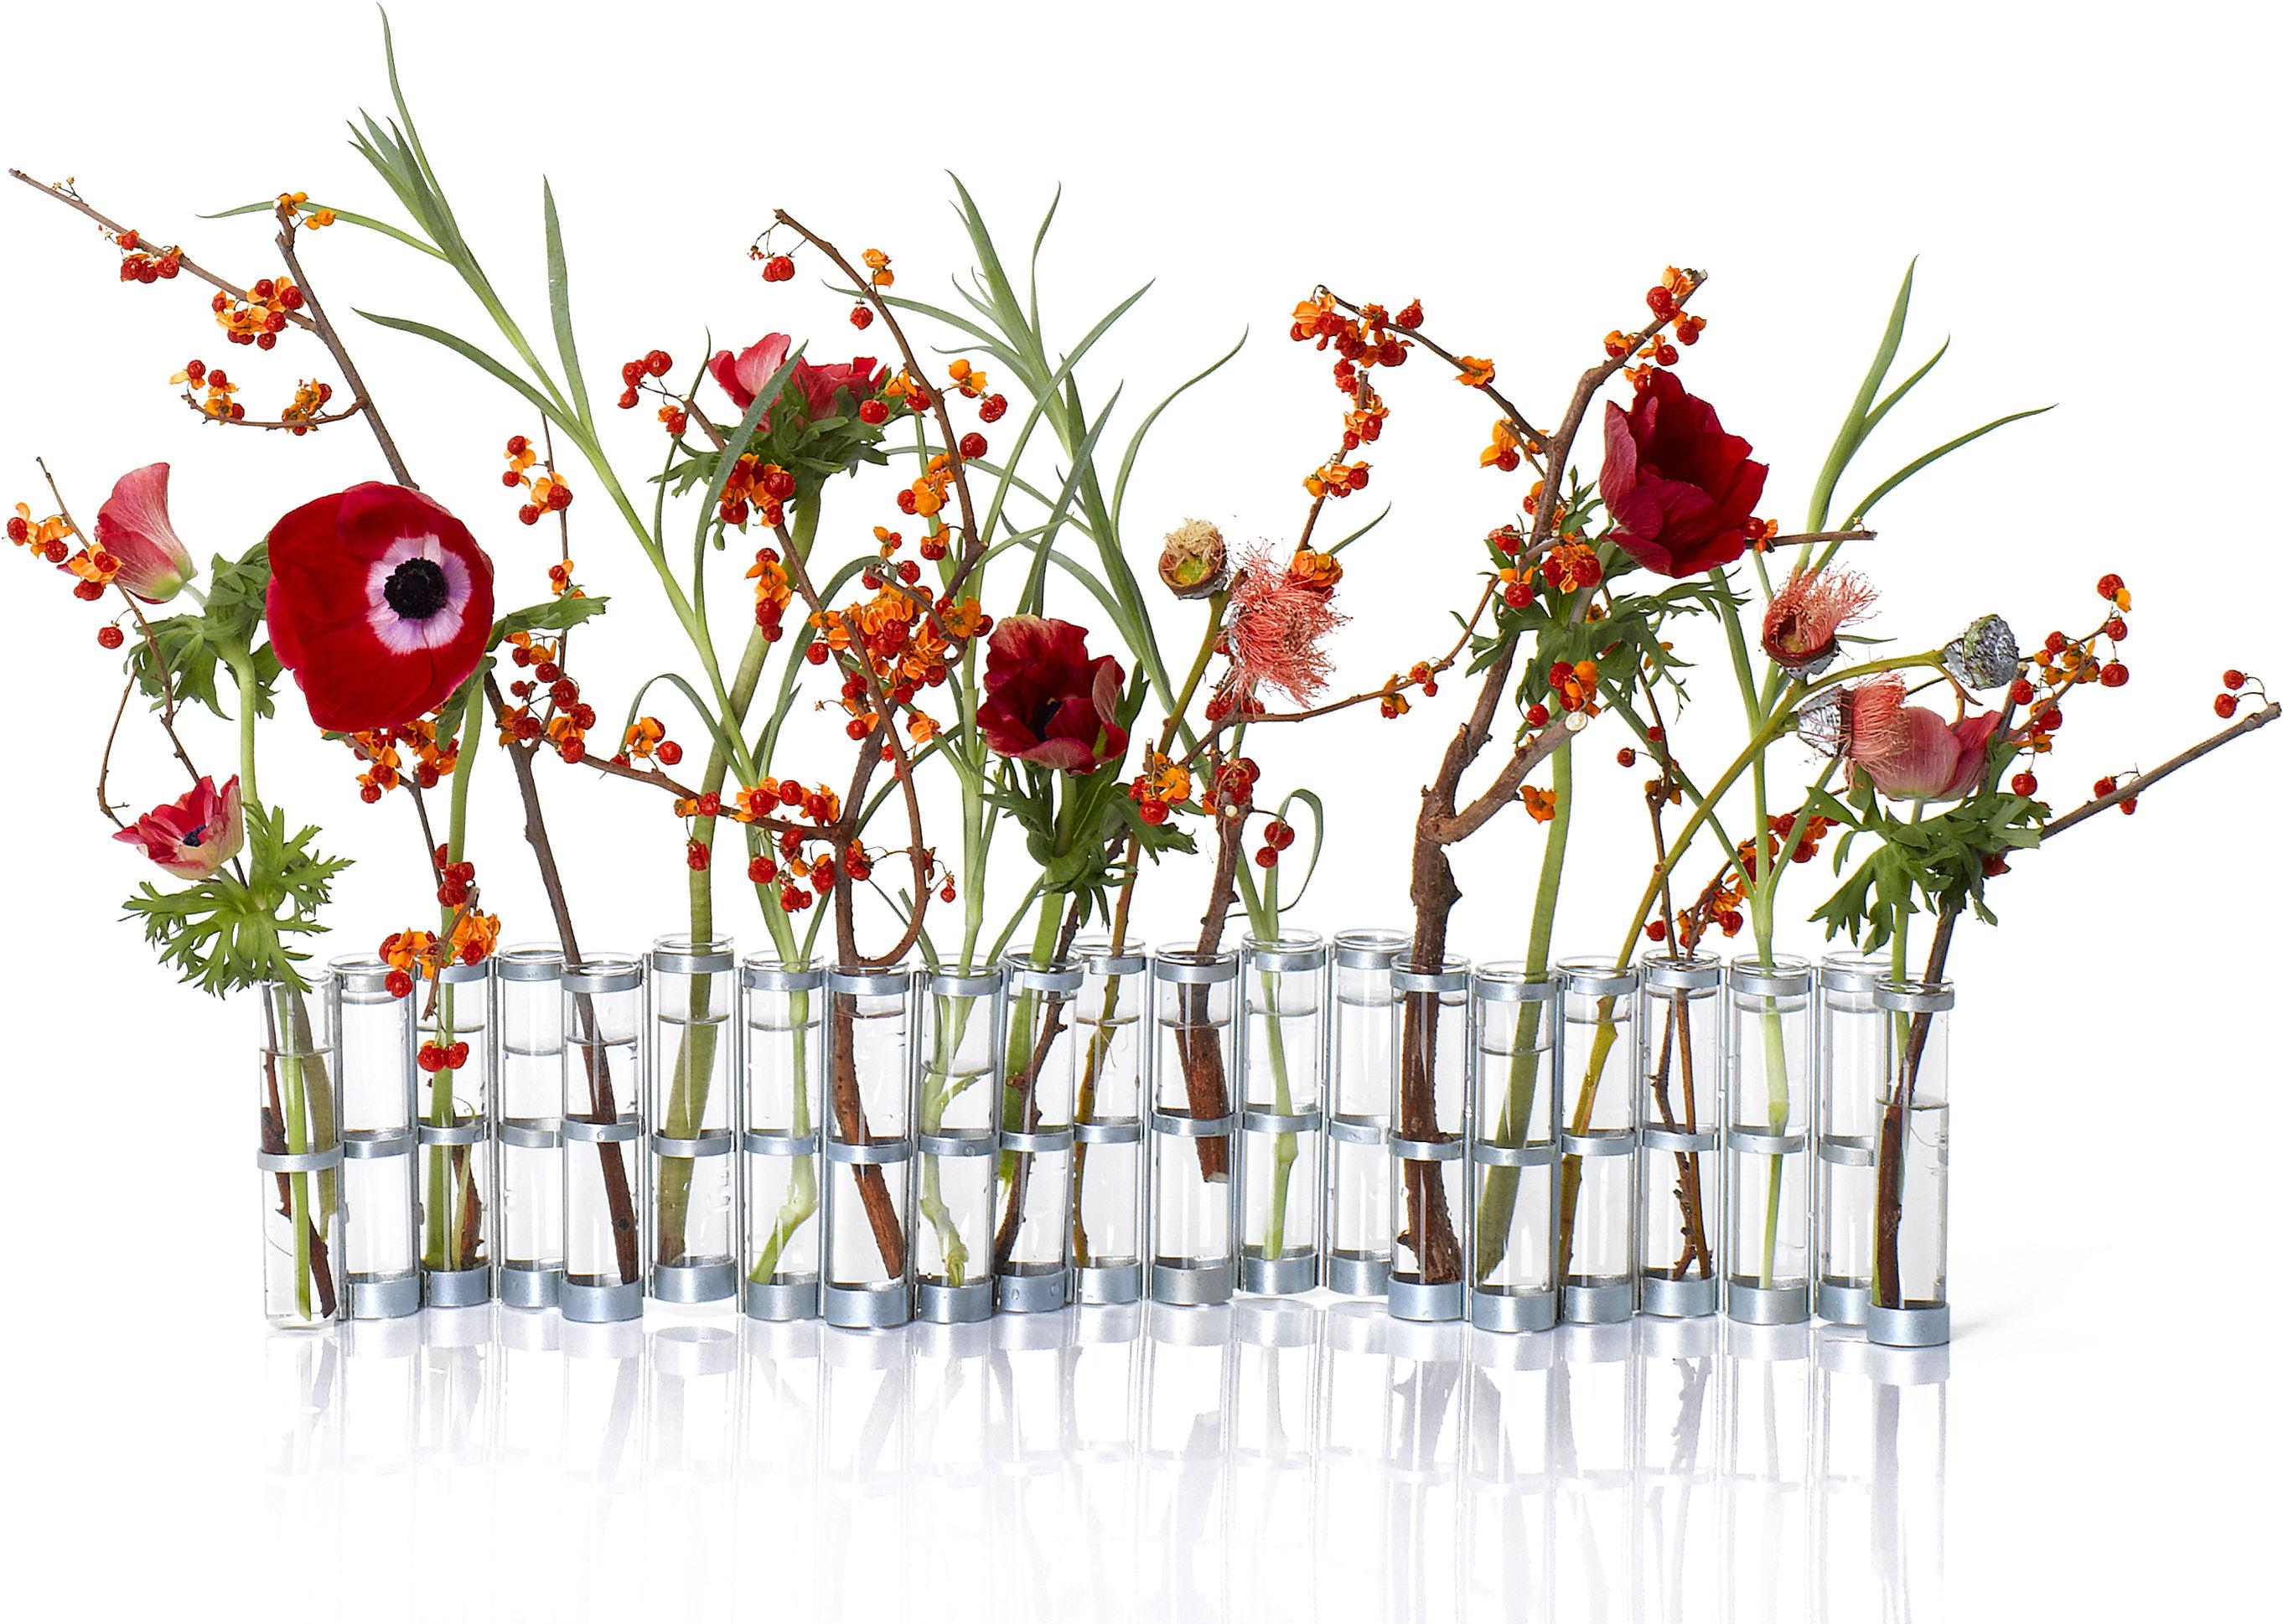 Decoration - Vases - d'avril Vase - Small / L 55 cm x H 10 cm by Tsé-Tsé - Small - L 55 cm x H 10 cm - Blown glass, Zinc coated steel